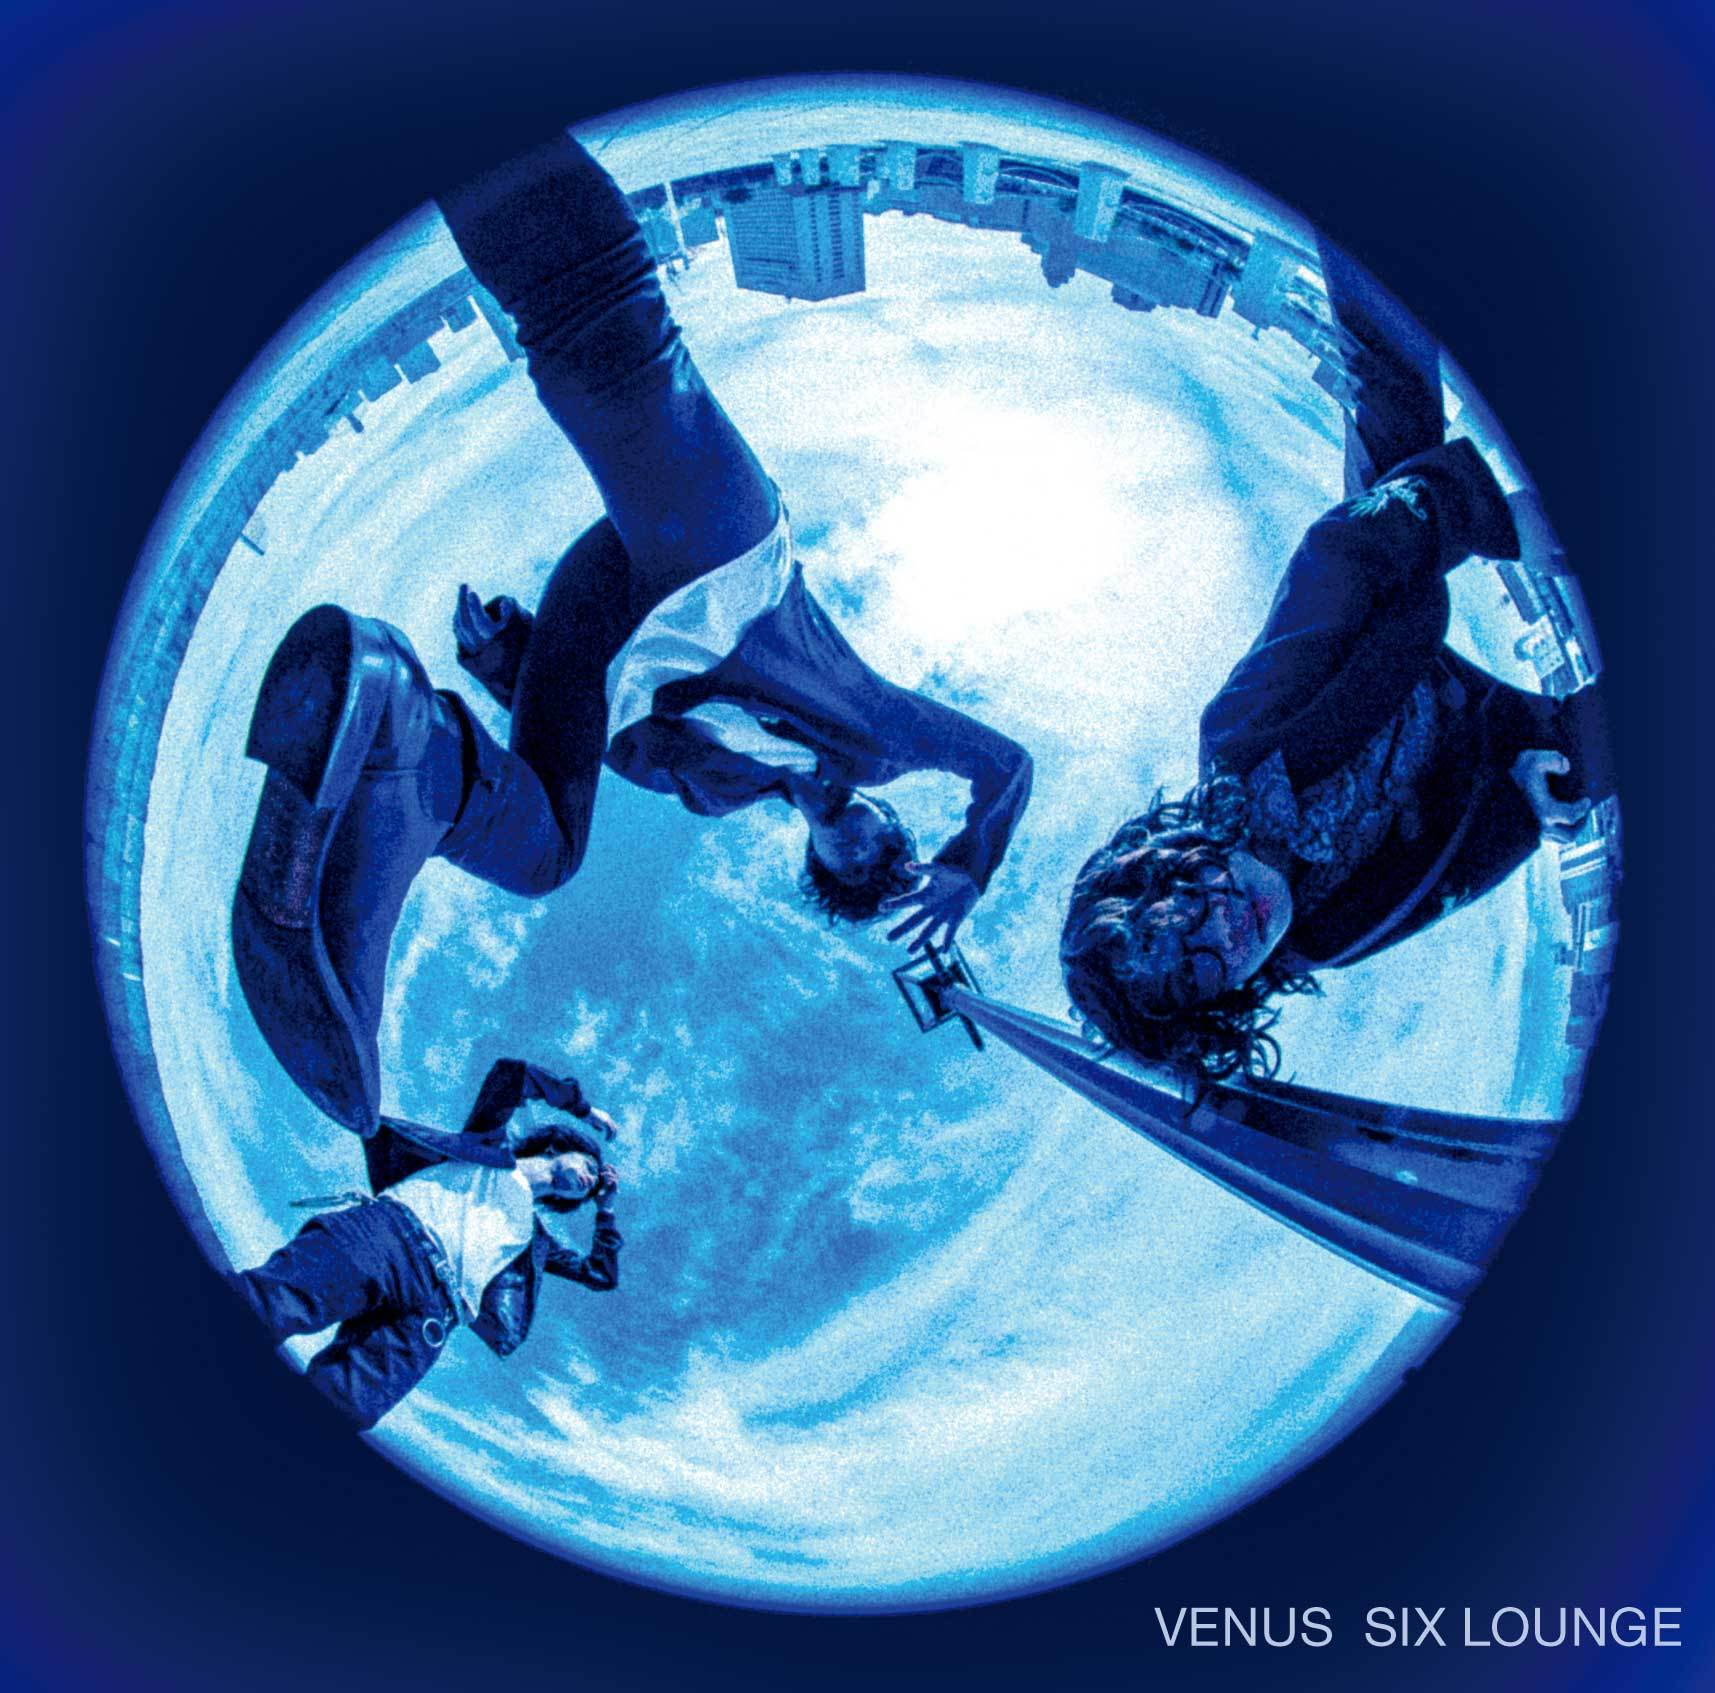 Venus%e5%88%9d%e5%9b%9e%e7%9b%a4%e3%82%b7%e3%82%99%e3%83%a3%e3%82%b1%e5%86%99s